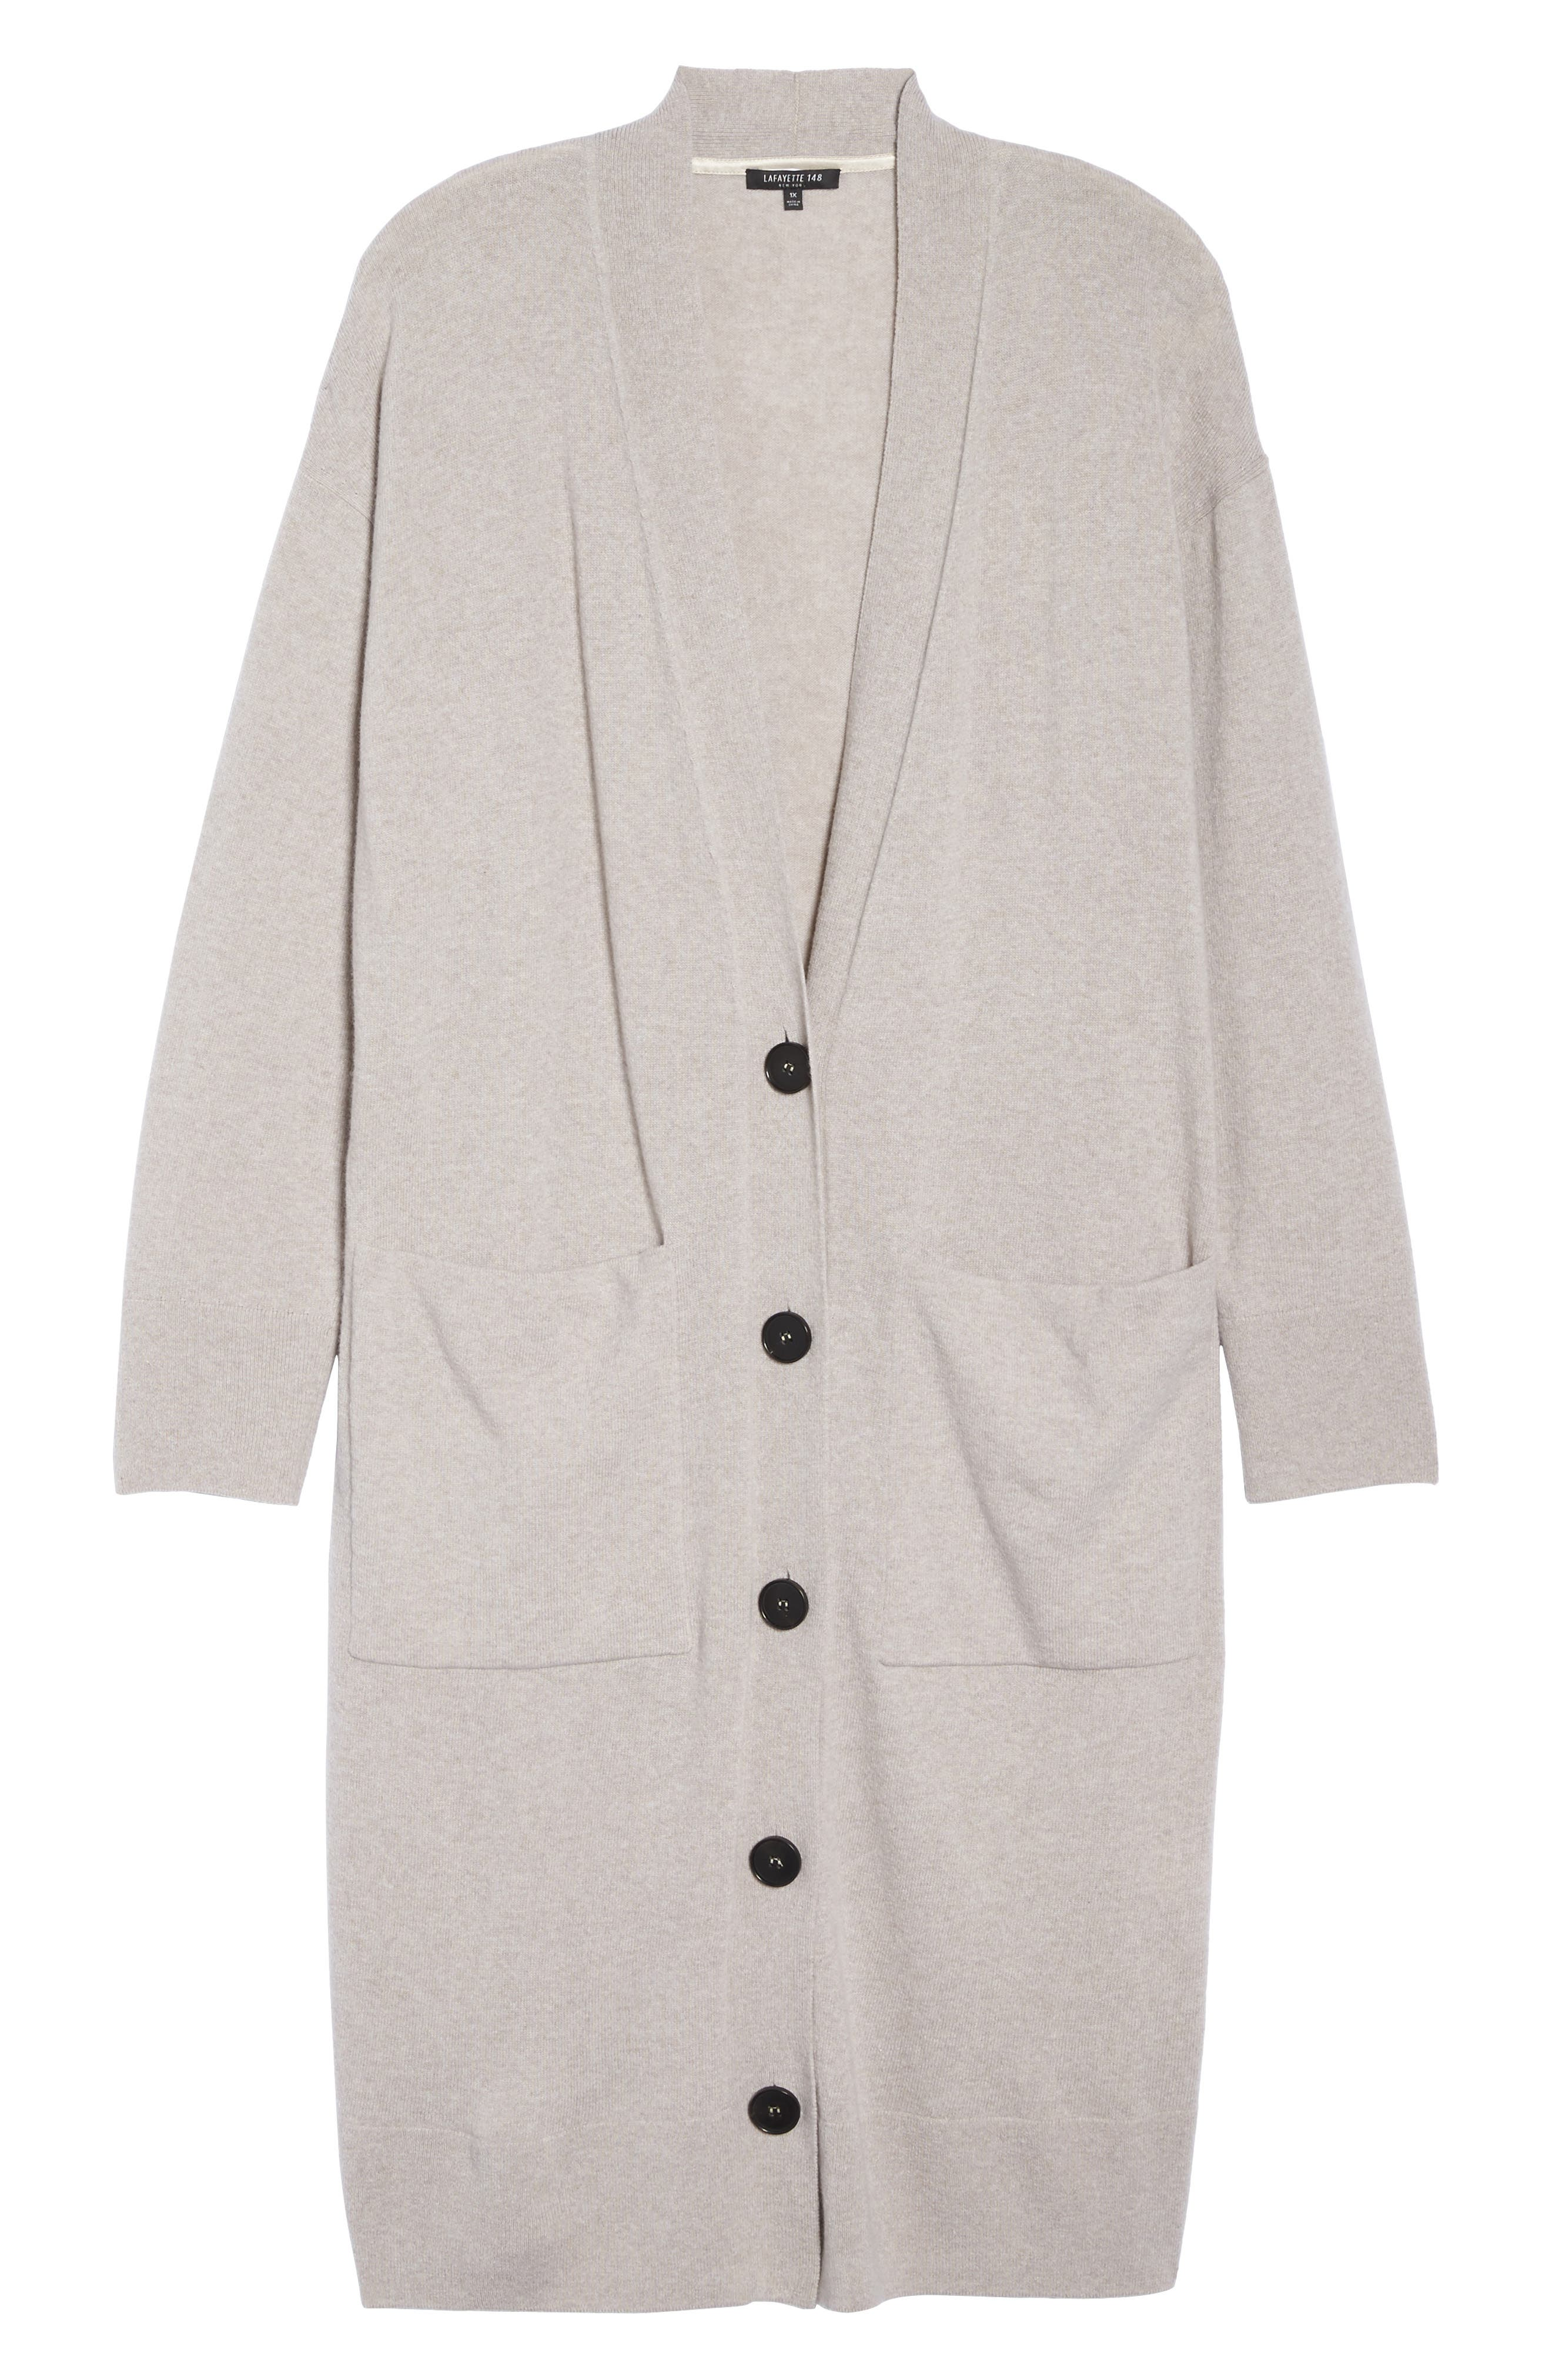 Long Merino Wool & Cashmere Cardigan,                             Alternate thumbnail 6, color,                             Luxor Melange